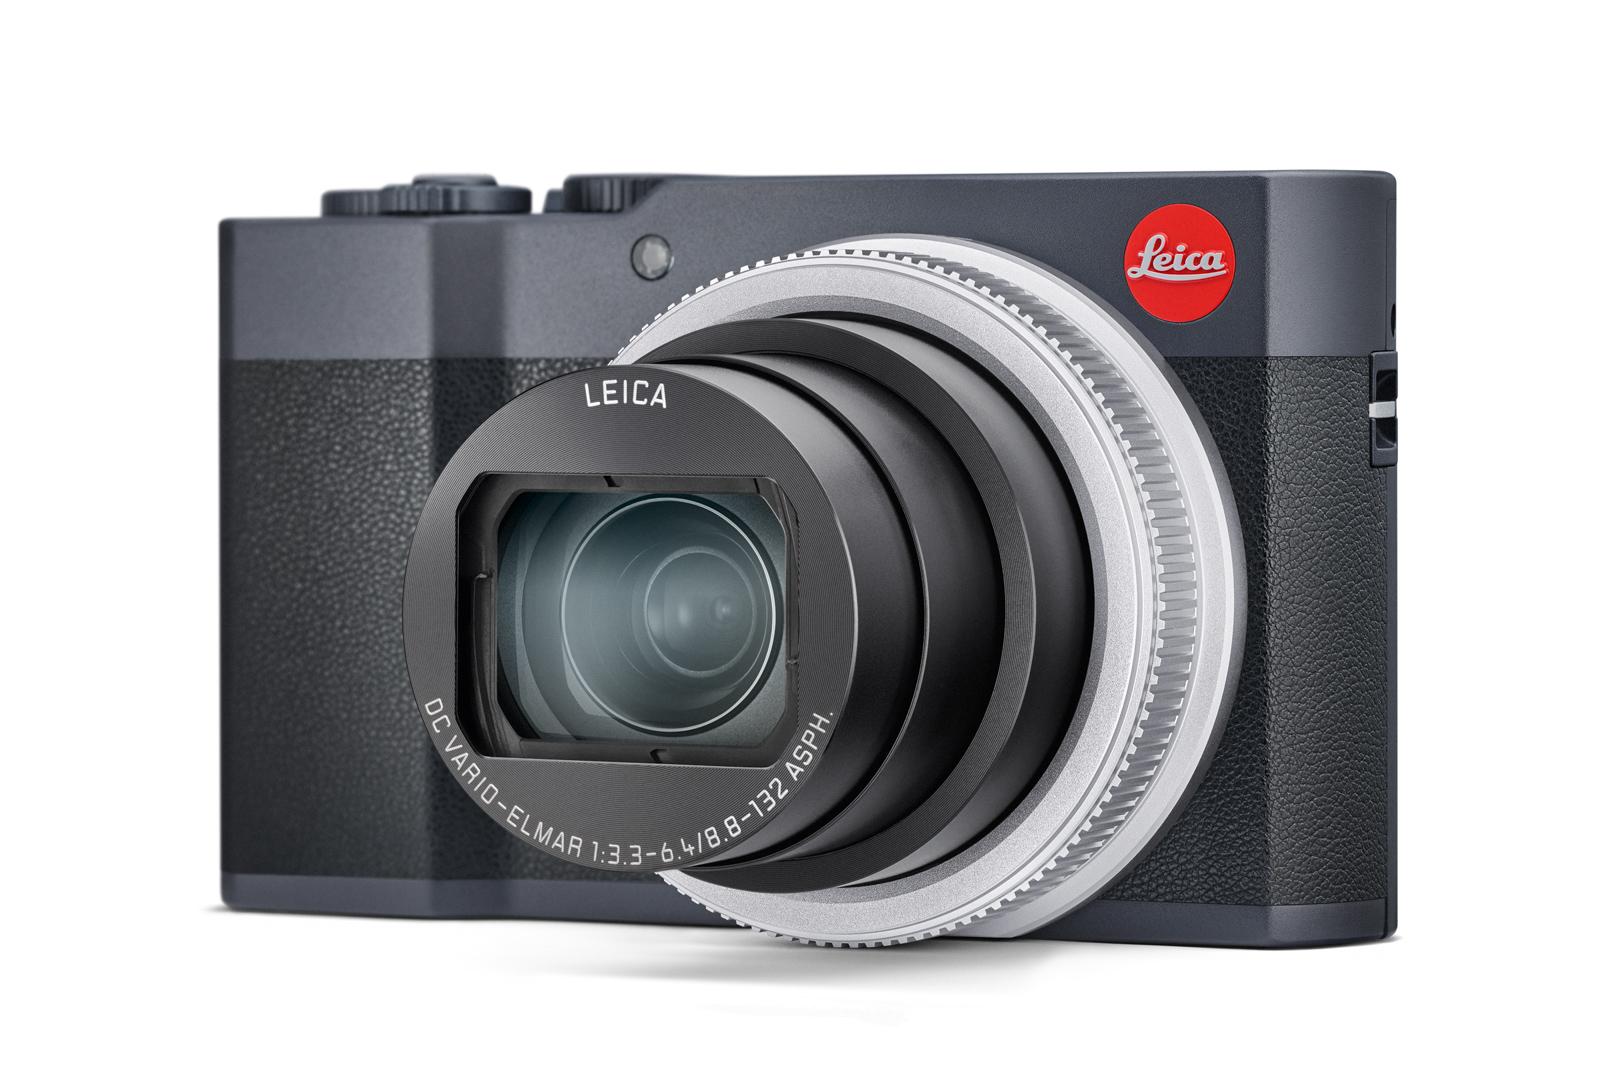 Leica C-Lux midnight blue